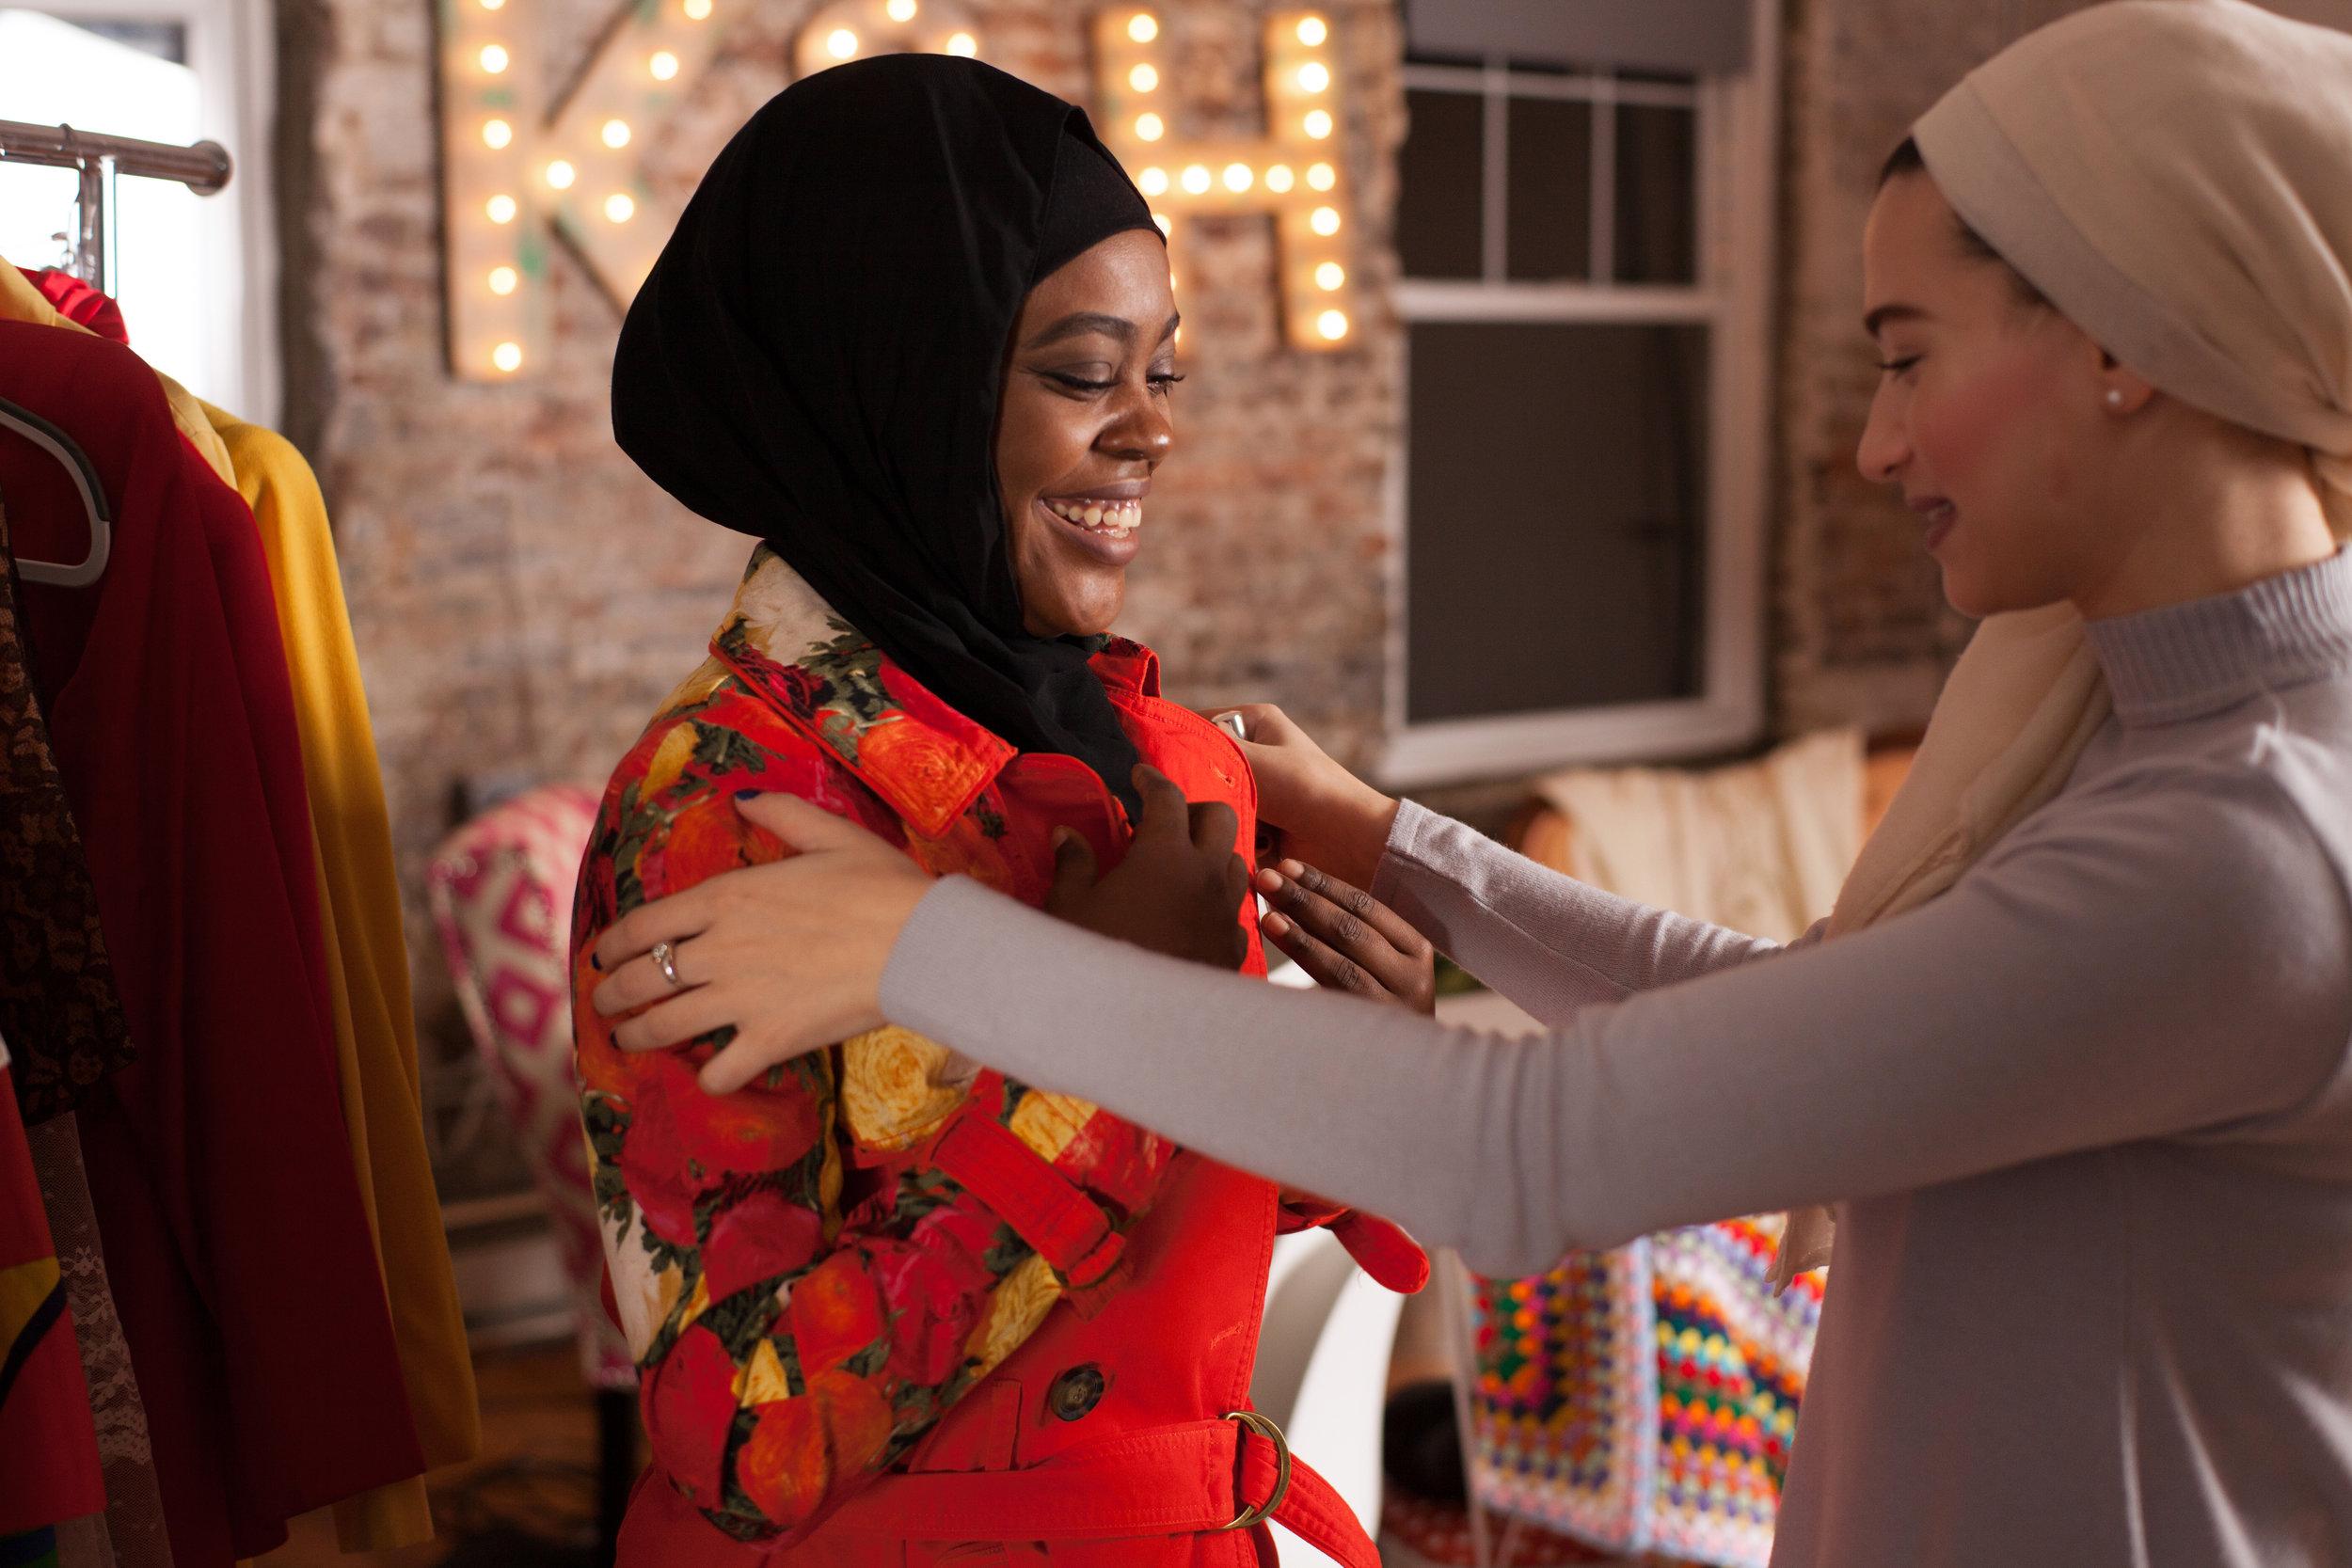 Muslim Girl Getty Images